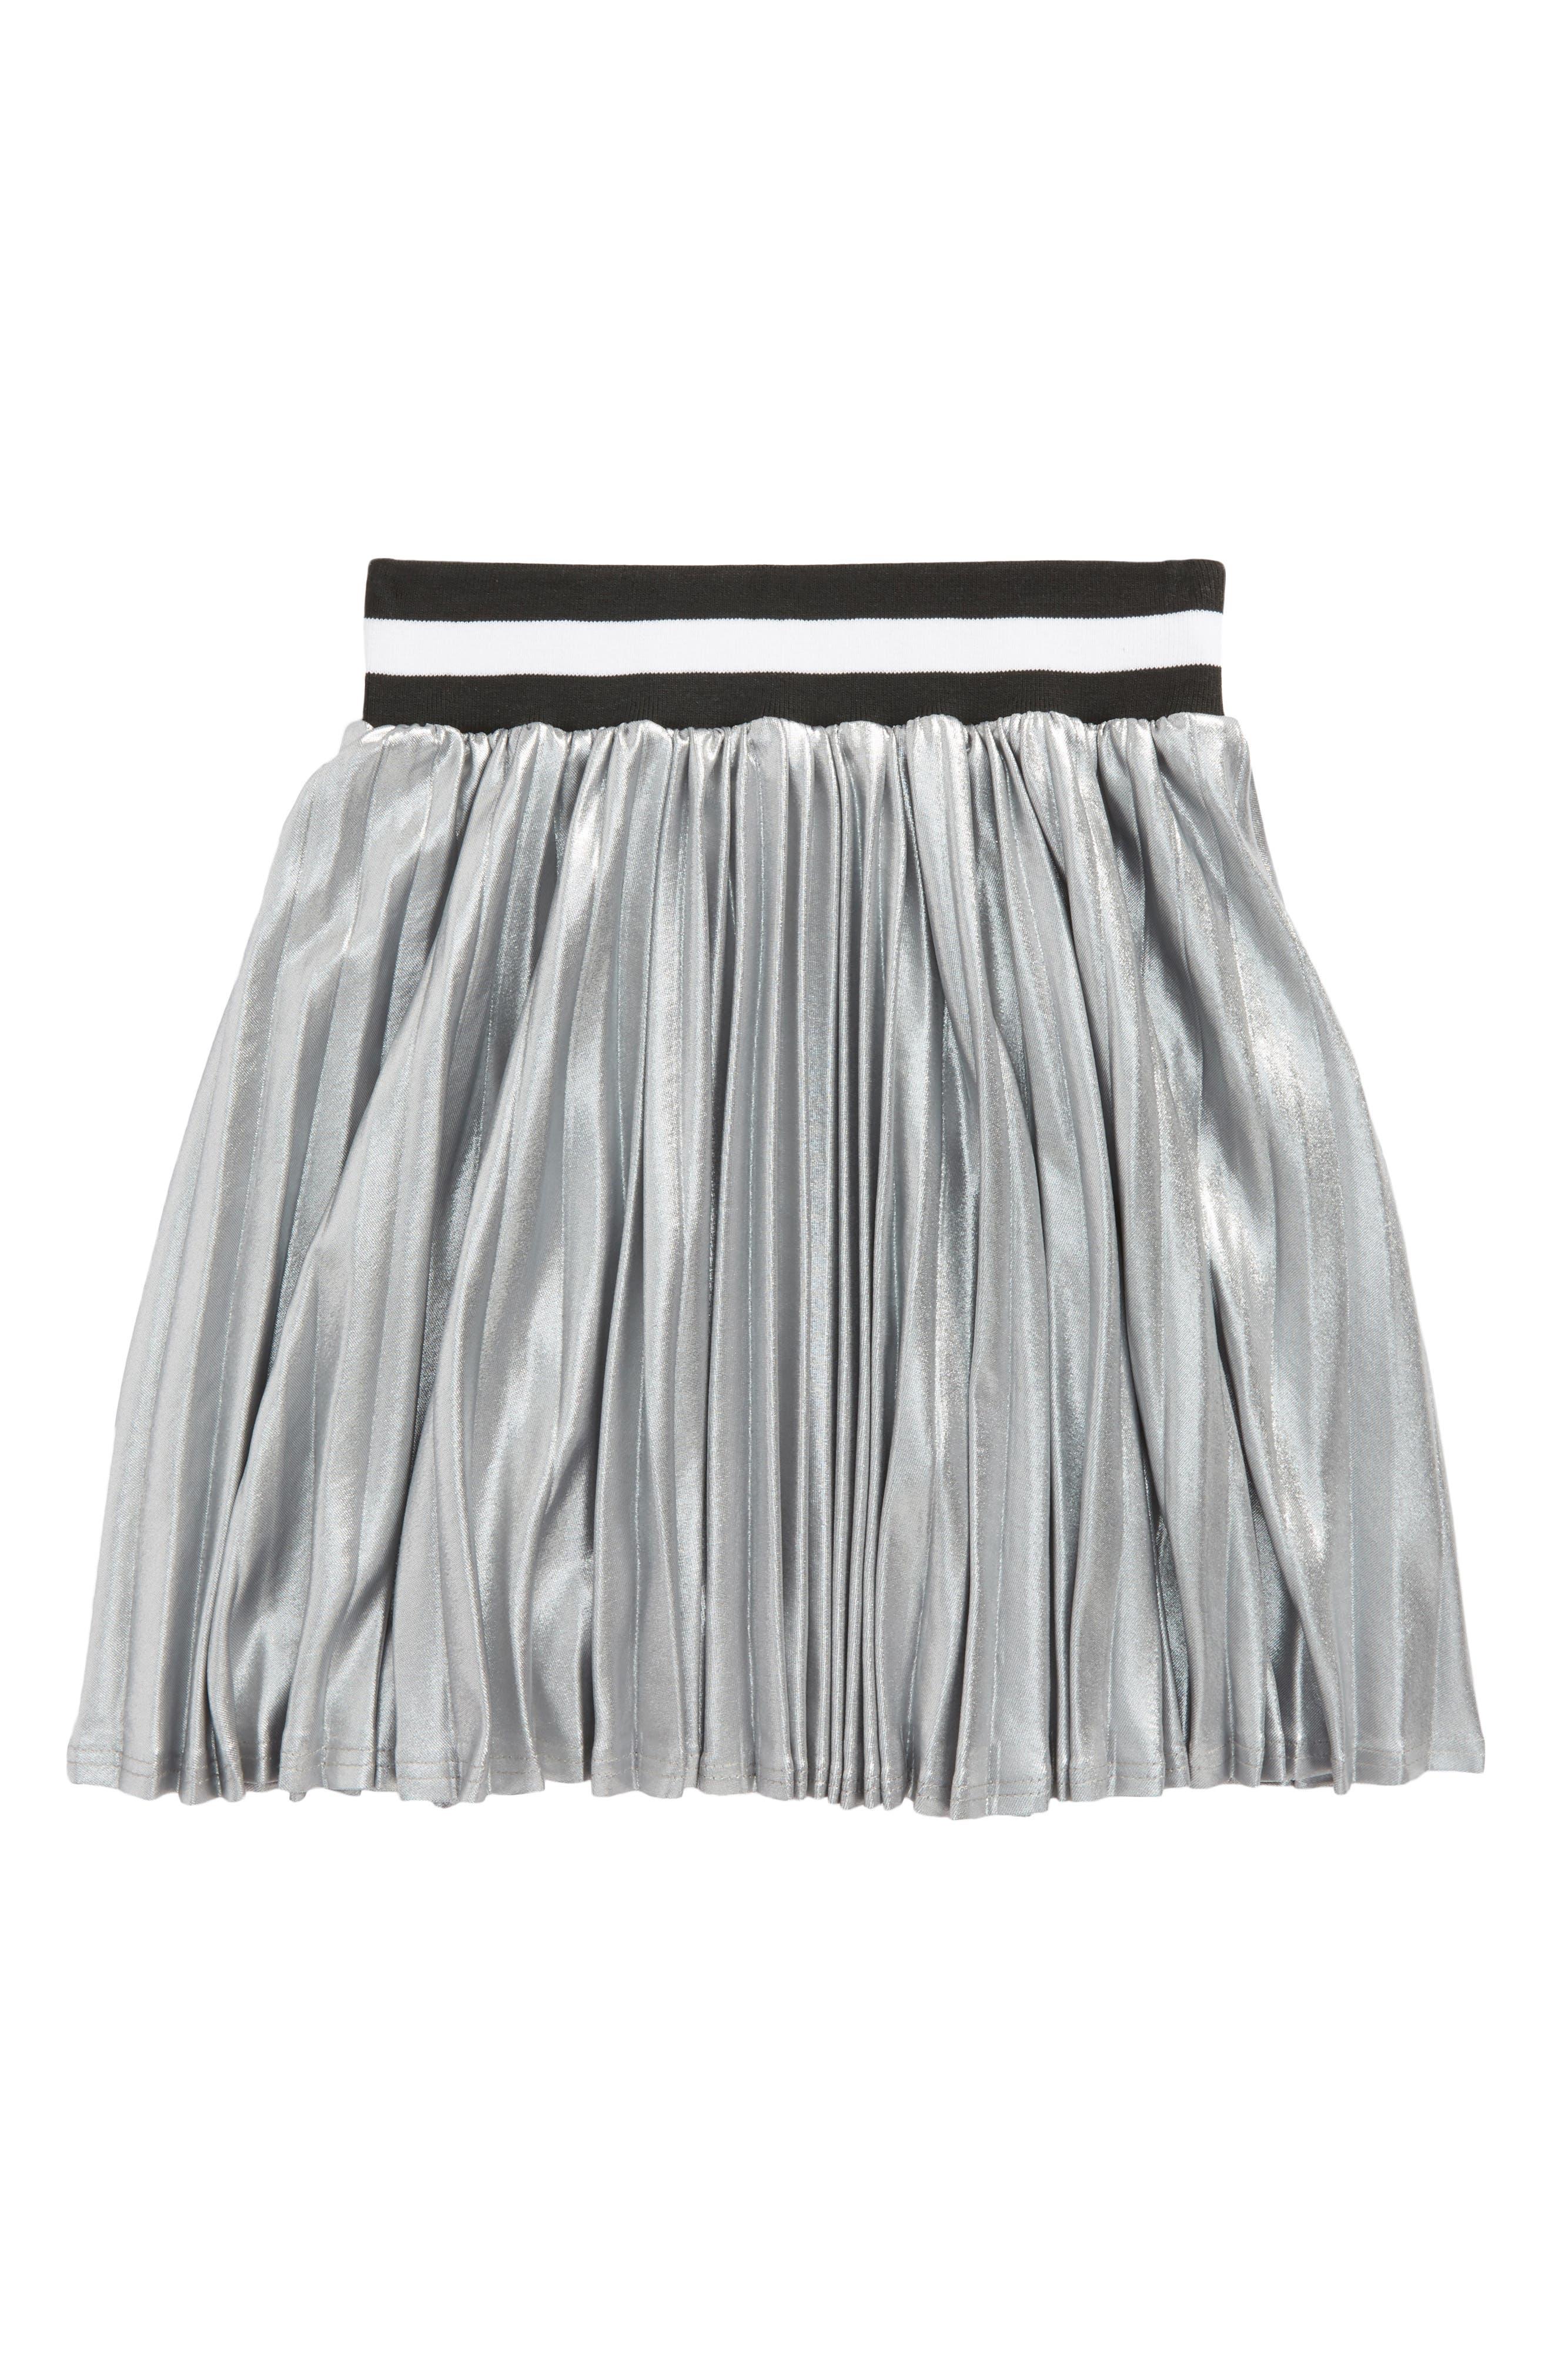 Aly Skirt,                             Main thumbnail 1, color,                             040